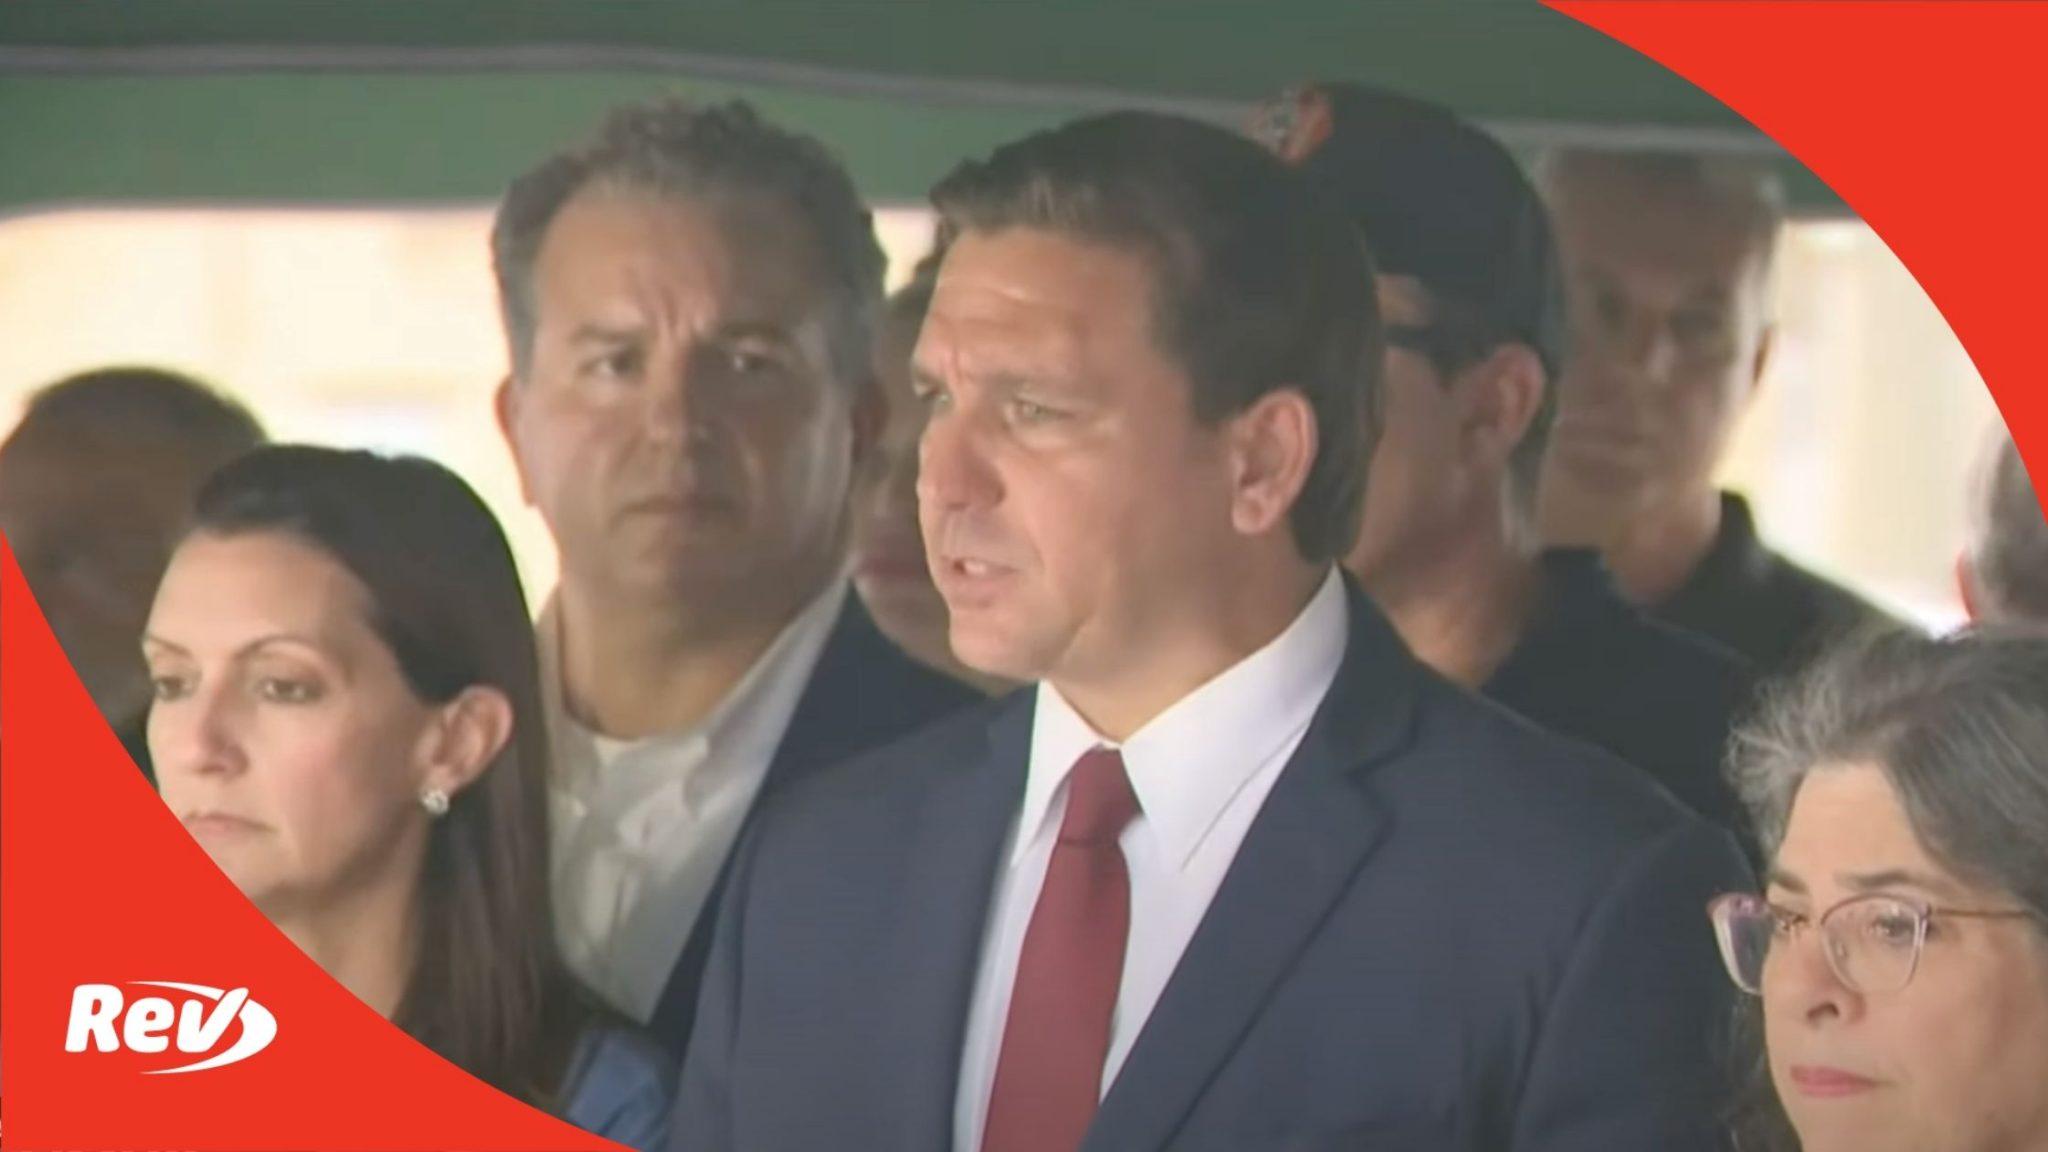 Ron DeSantis Press Conference on Miami Building Collapse